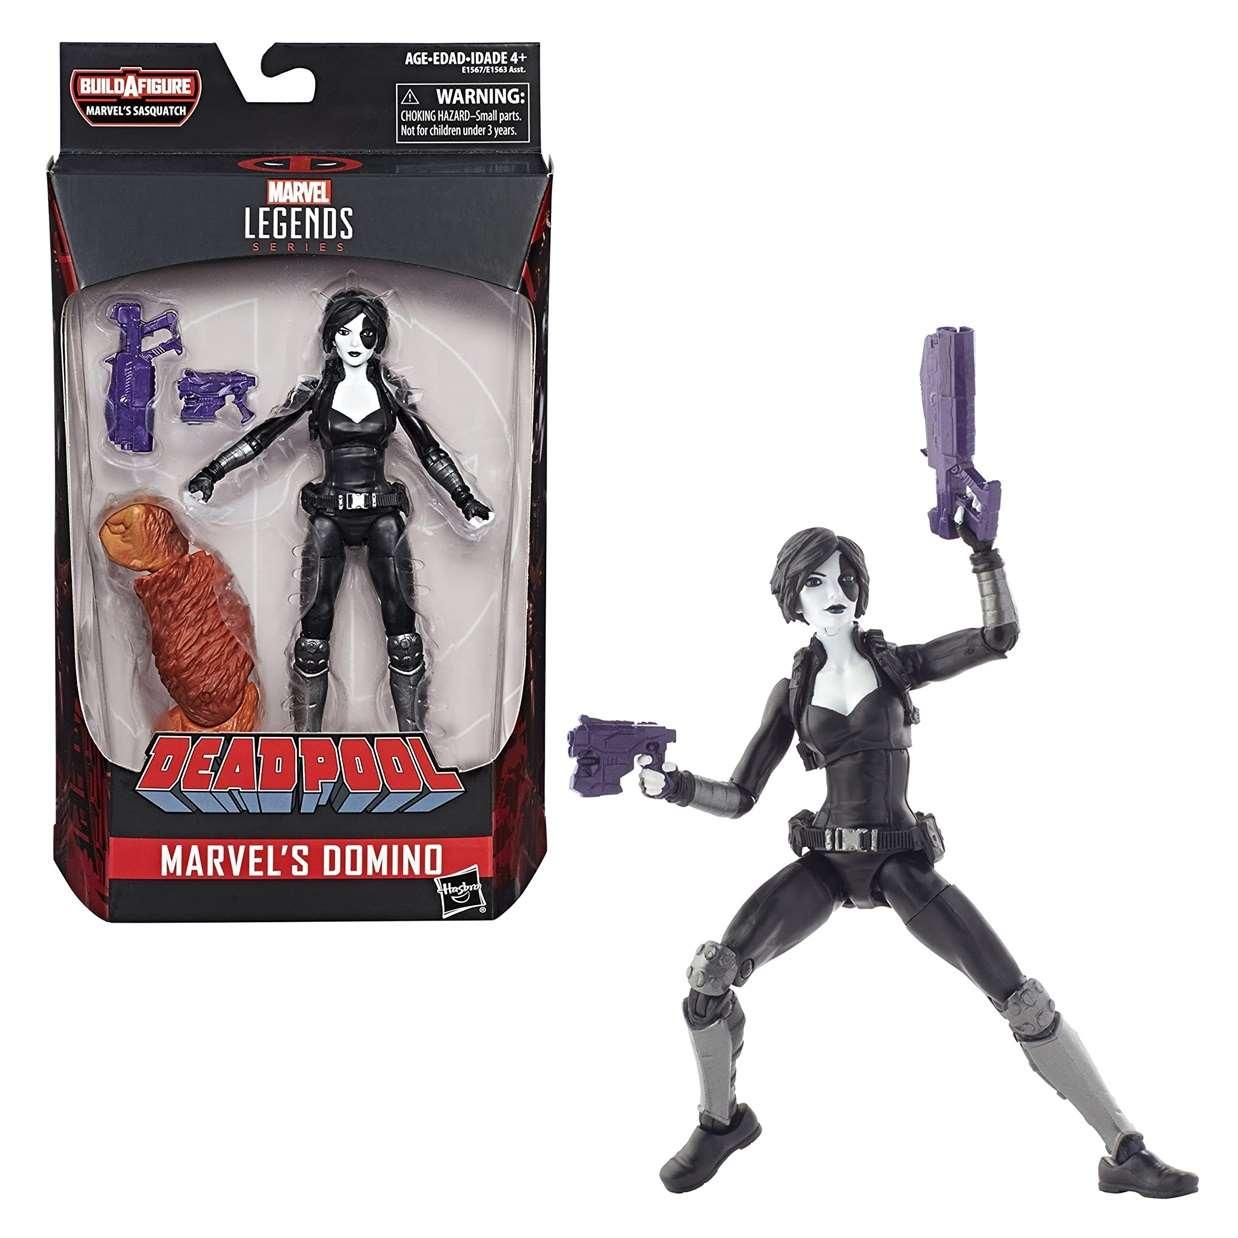 Domino Figura Marvel B A F Sasquatch Deadpool Legends 6 pULG